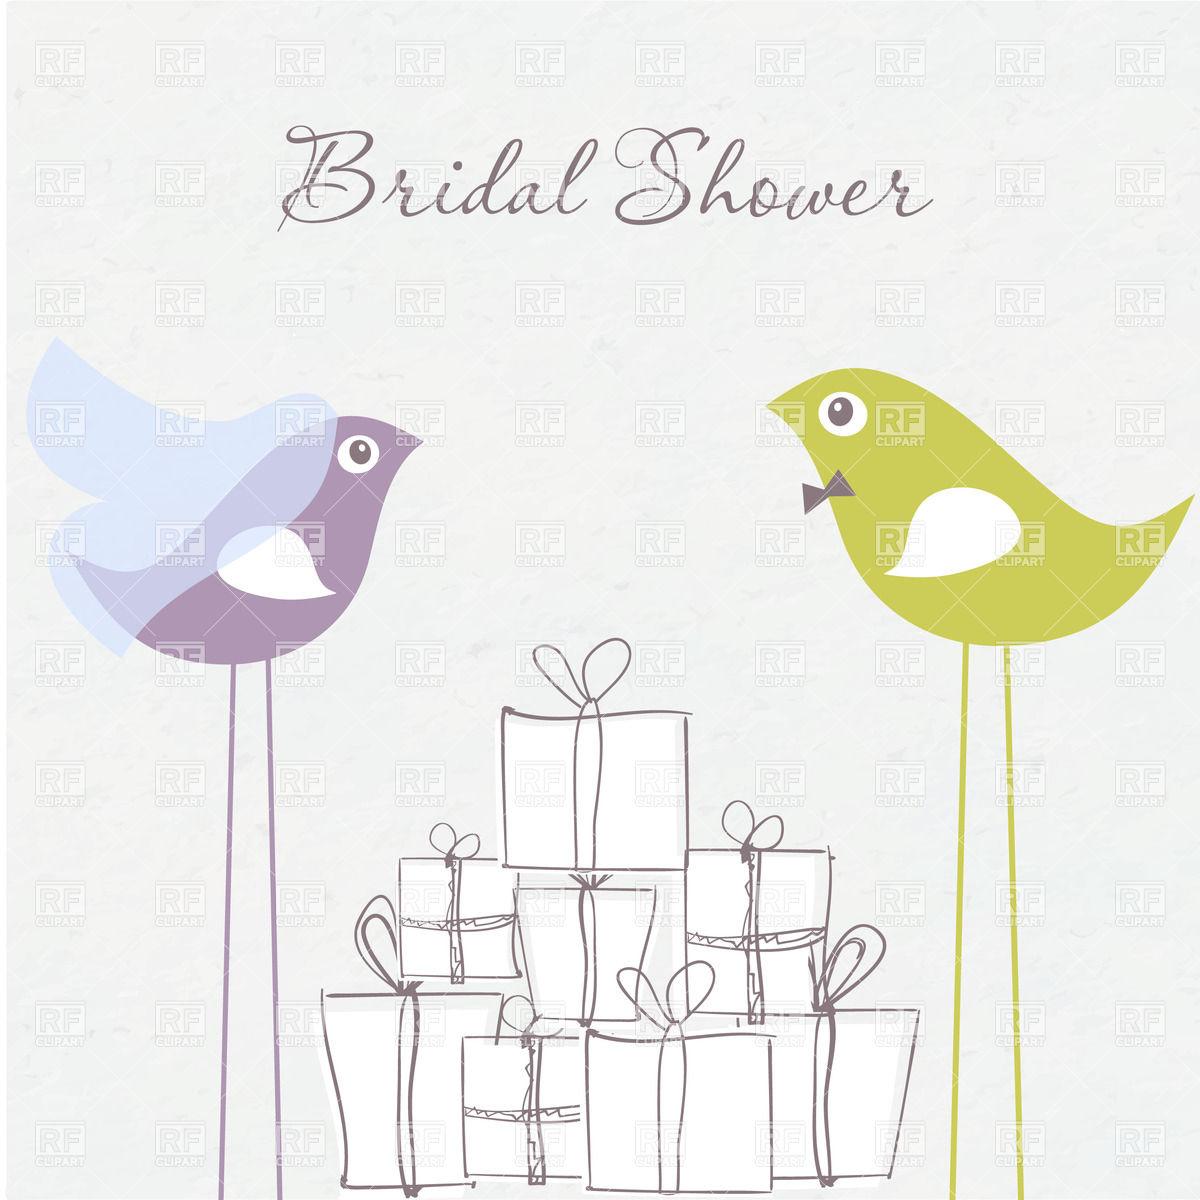 Wedding clipart for bridal showe banner freeuse 89+ Bridal Shower Clip Art Free | ClipartLook banner freeuse